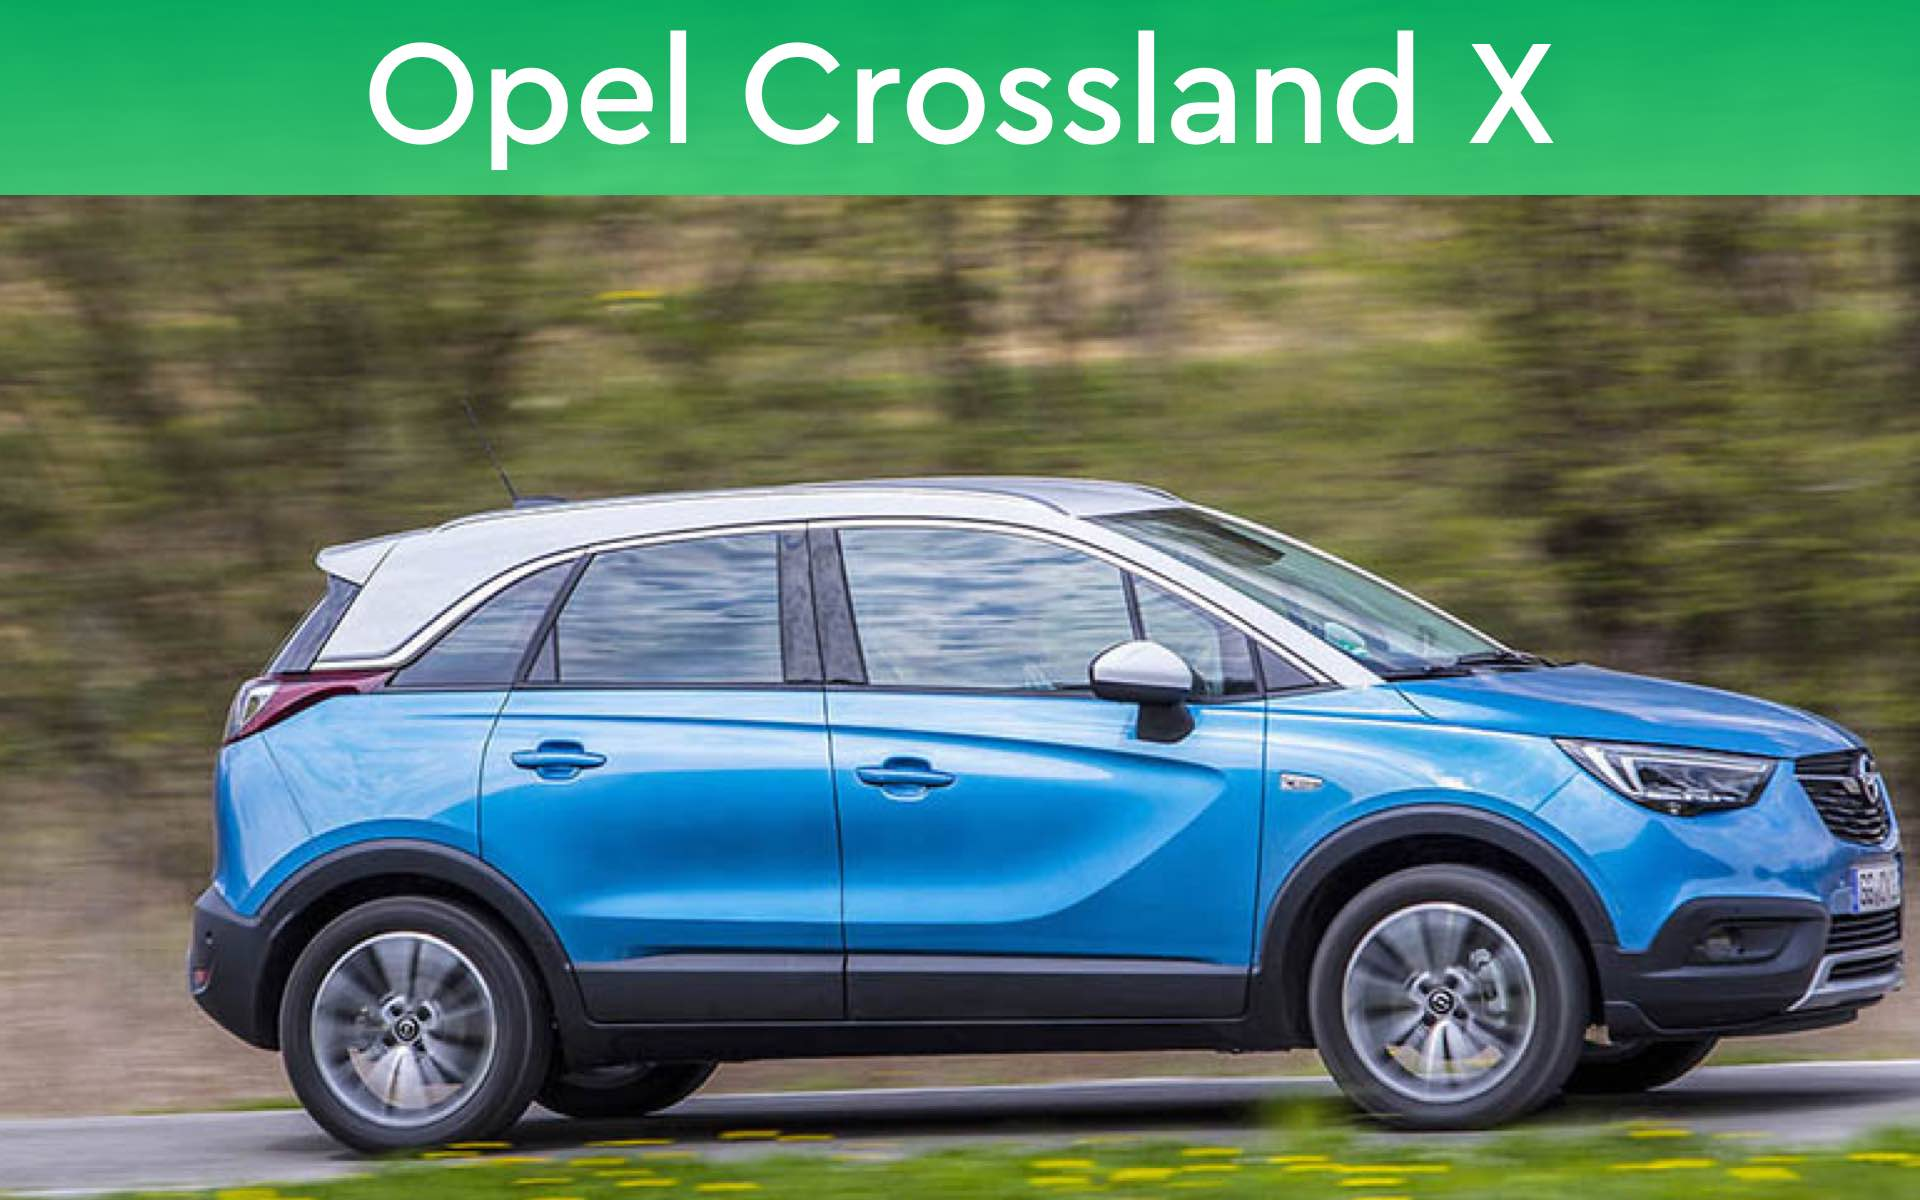 Opel Crossland X private lease